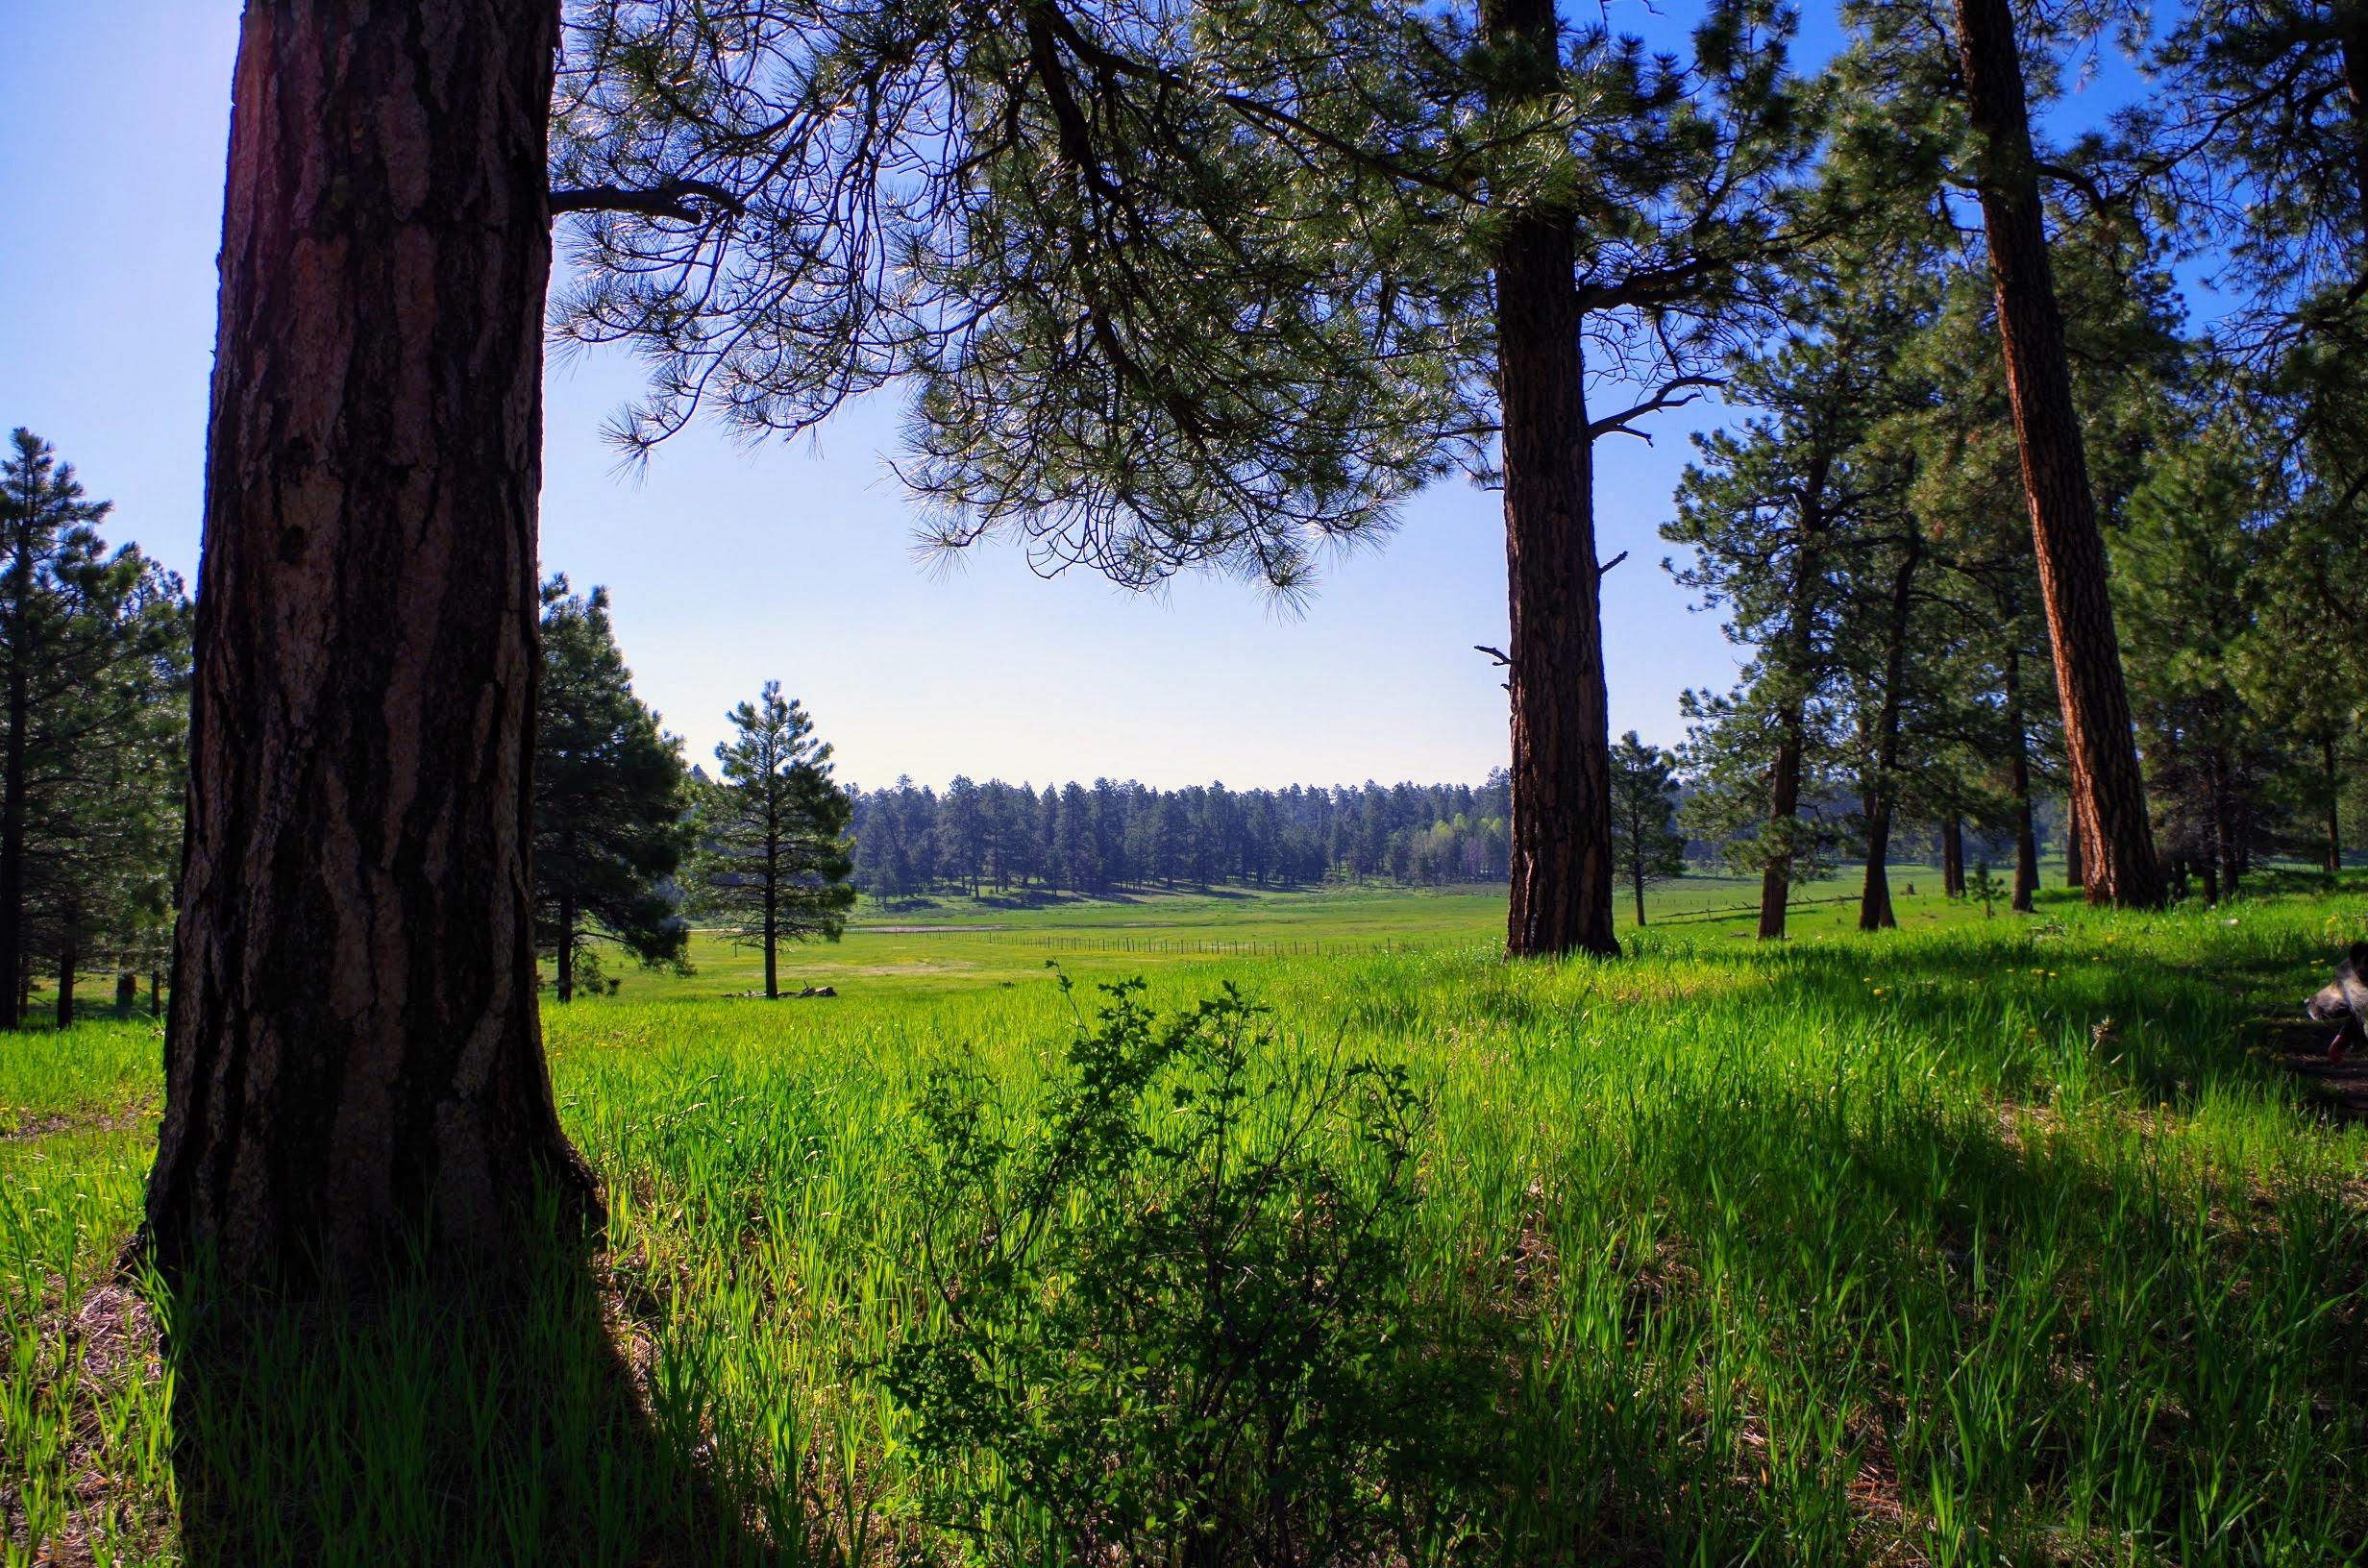 Chris Mountain Meadow Pagosa Springs